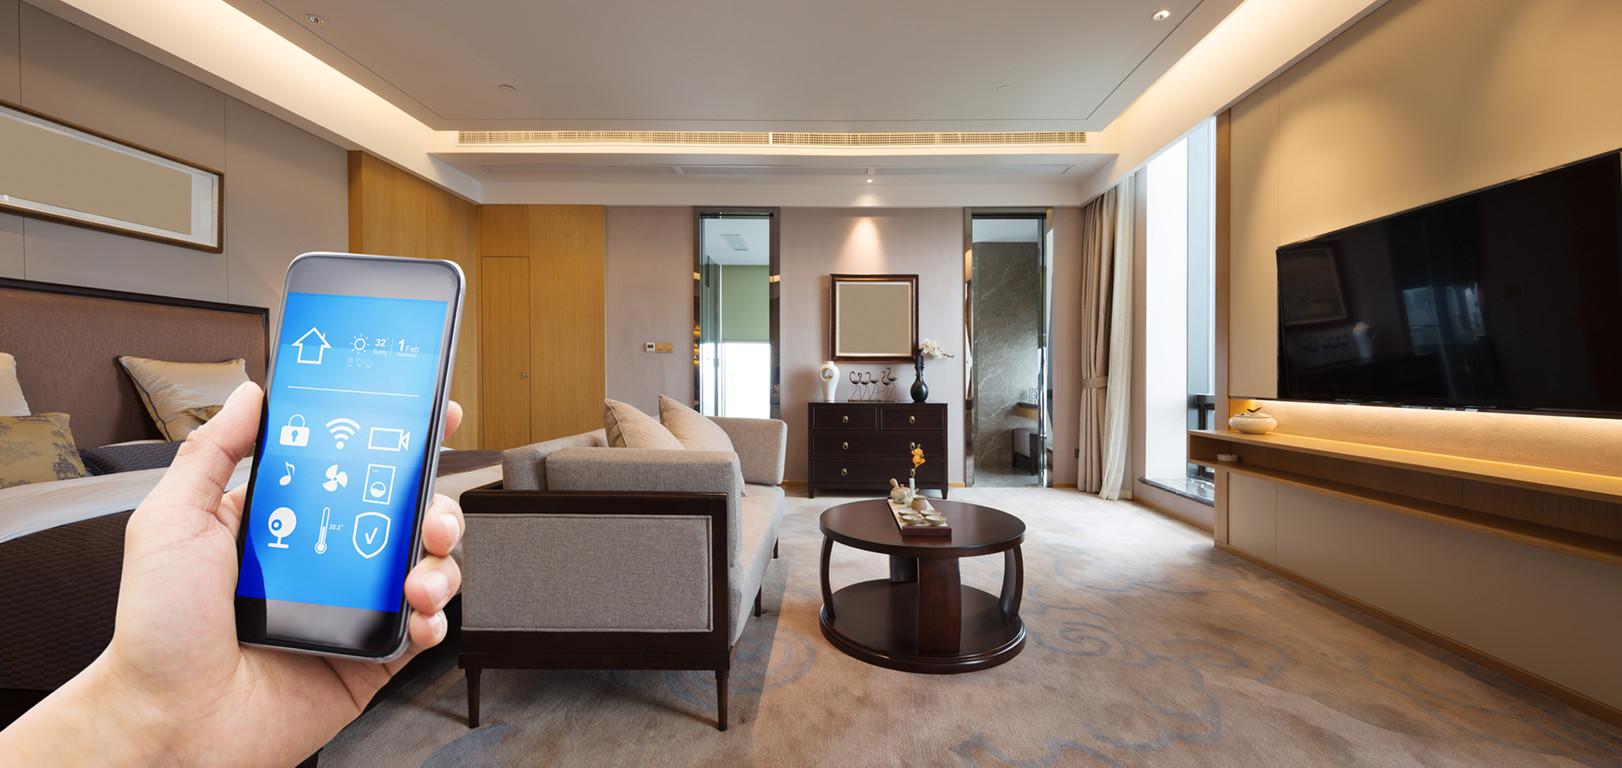 elektro stilper gmbh gira smart home in lauf. Black Bedroom Furniture Sets. Home Design Ideas